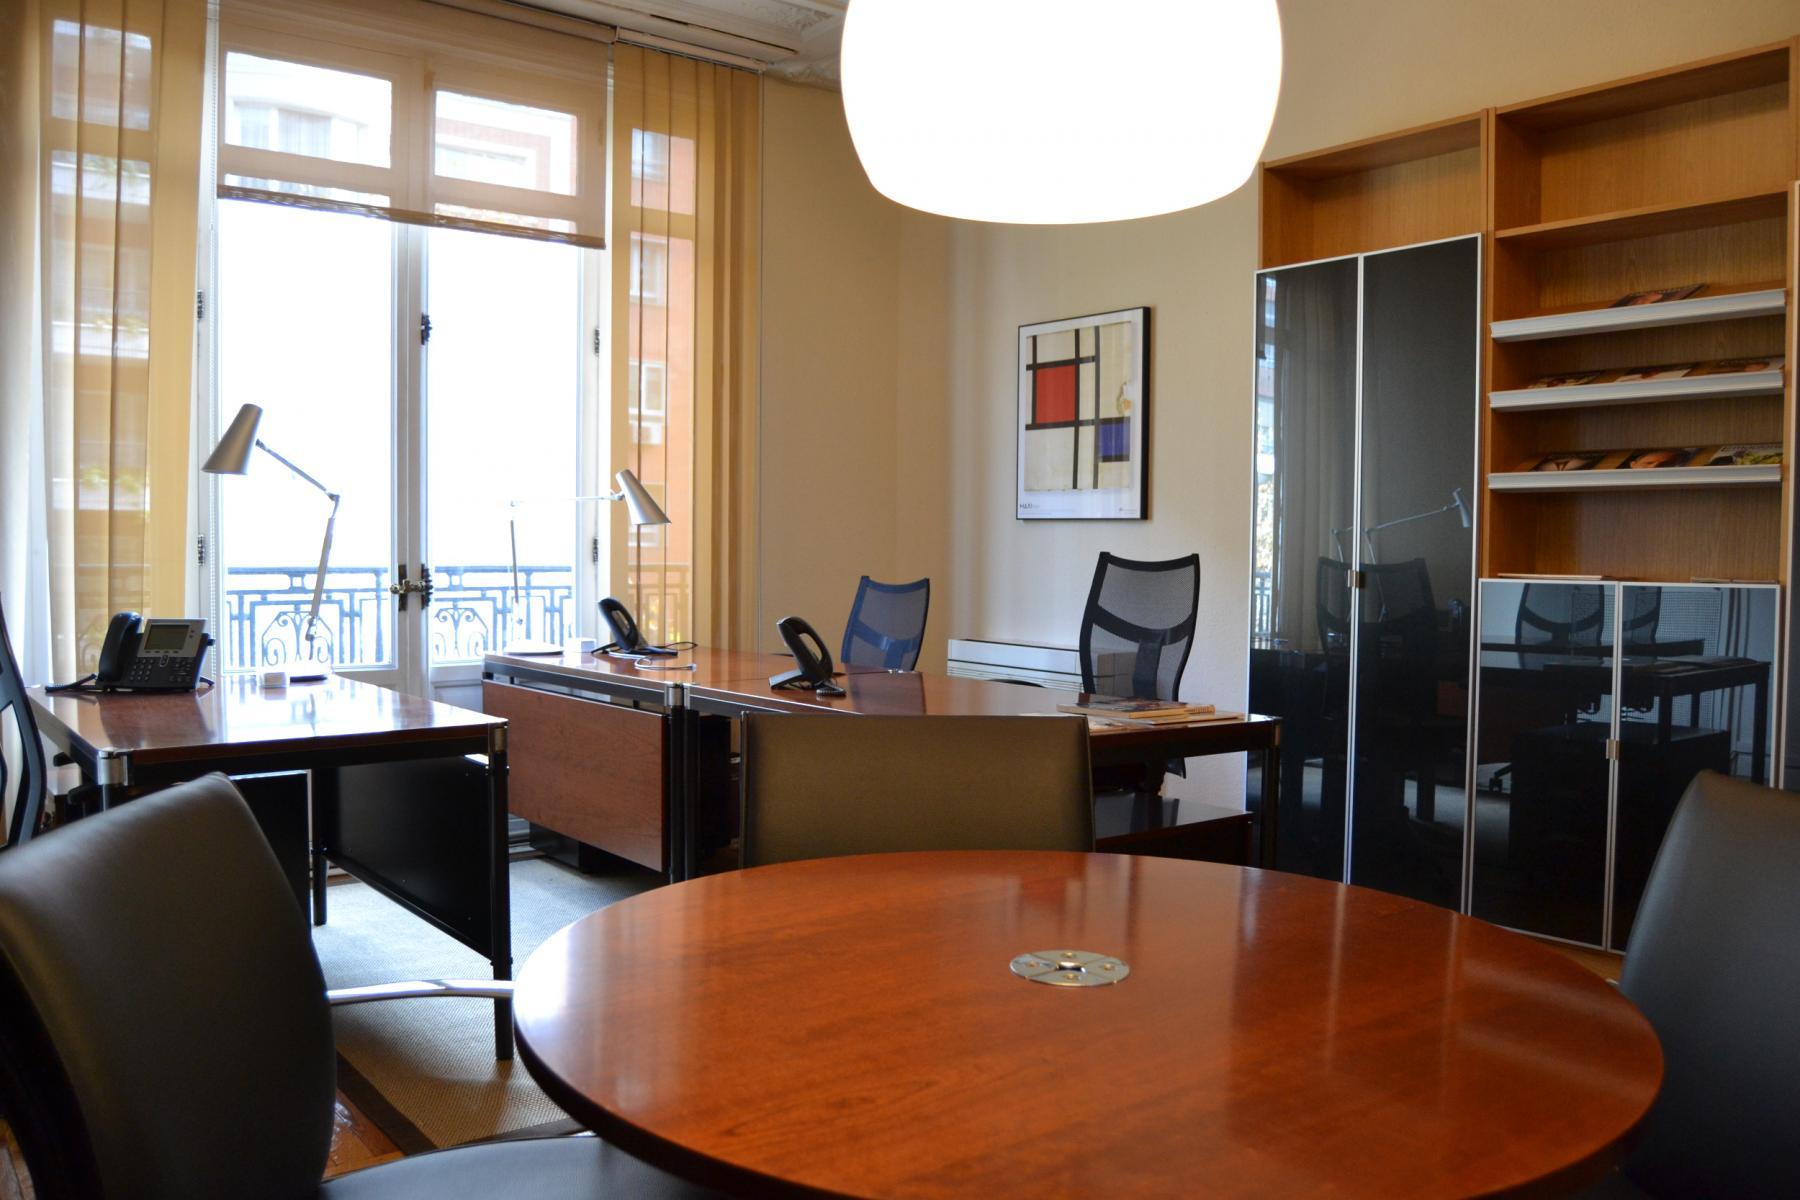 Alquilar oficinas Calle de Velázquez 94, Madrid (3)